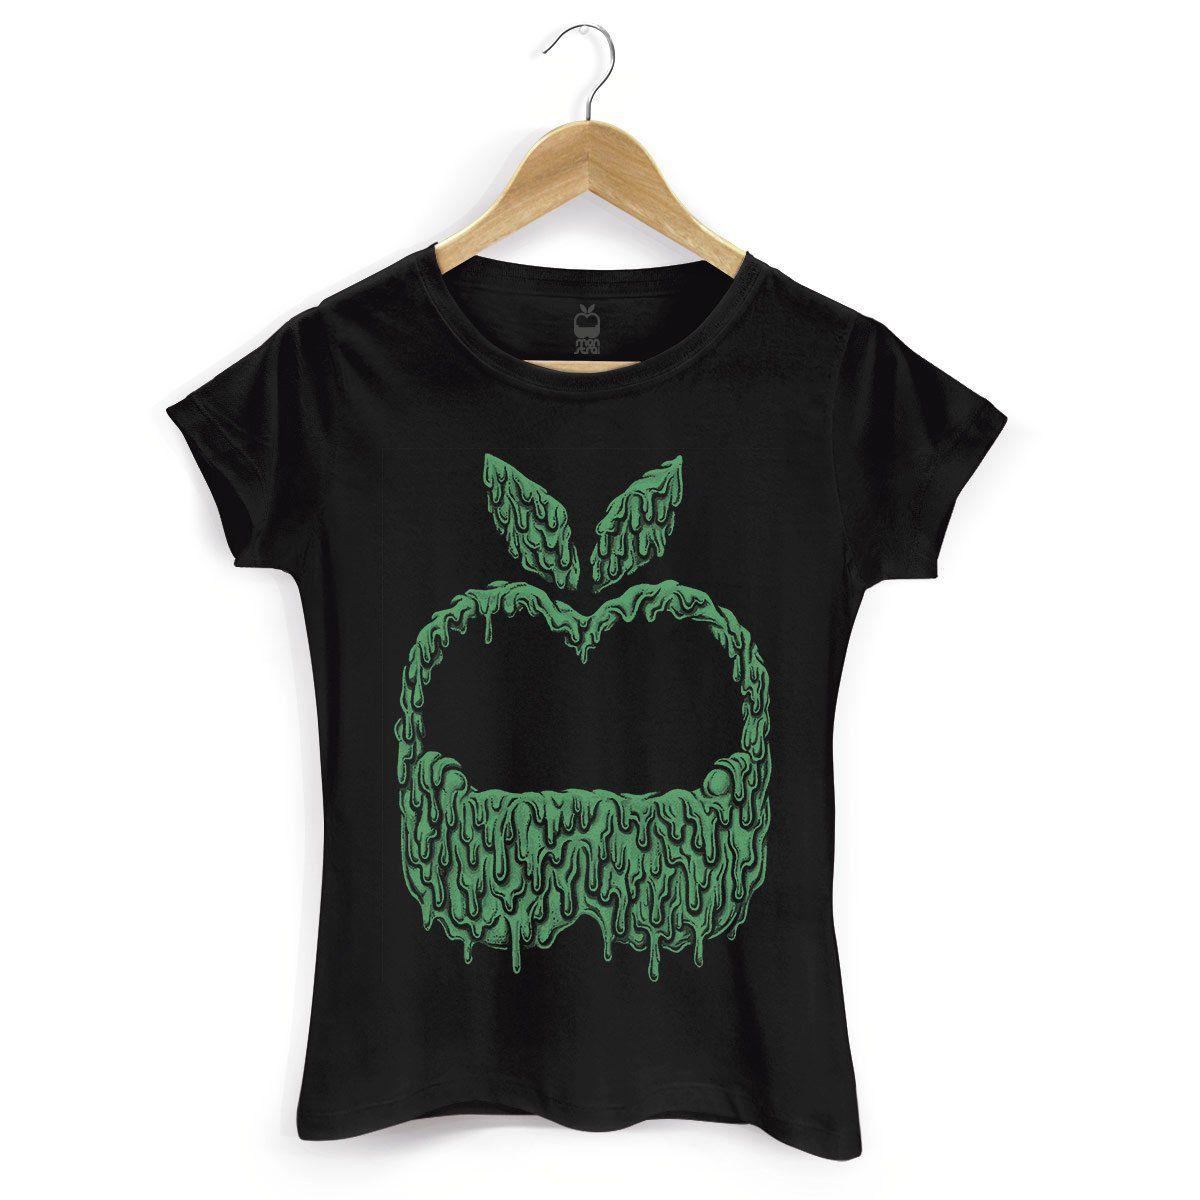 Camiseta Feminina Monstra Maçã Slime  - bandUP Store Marketplace